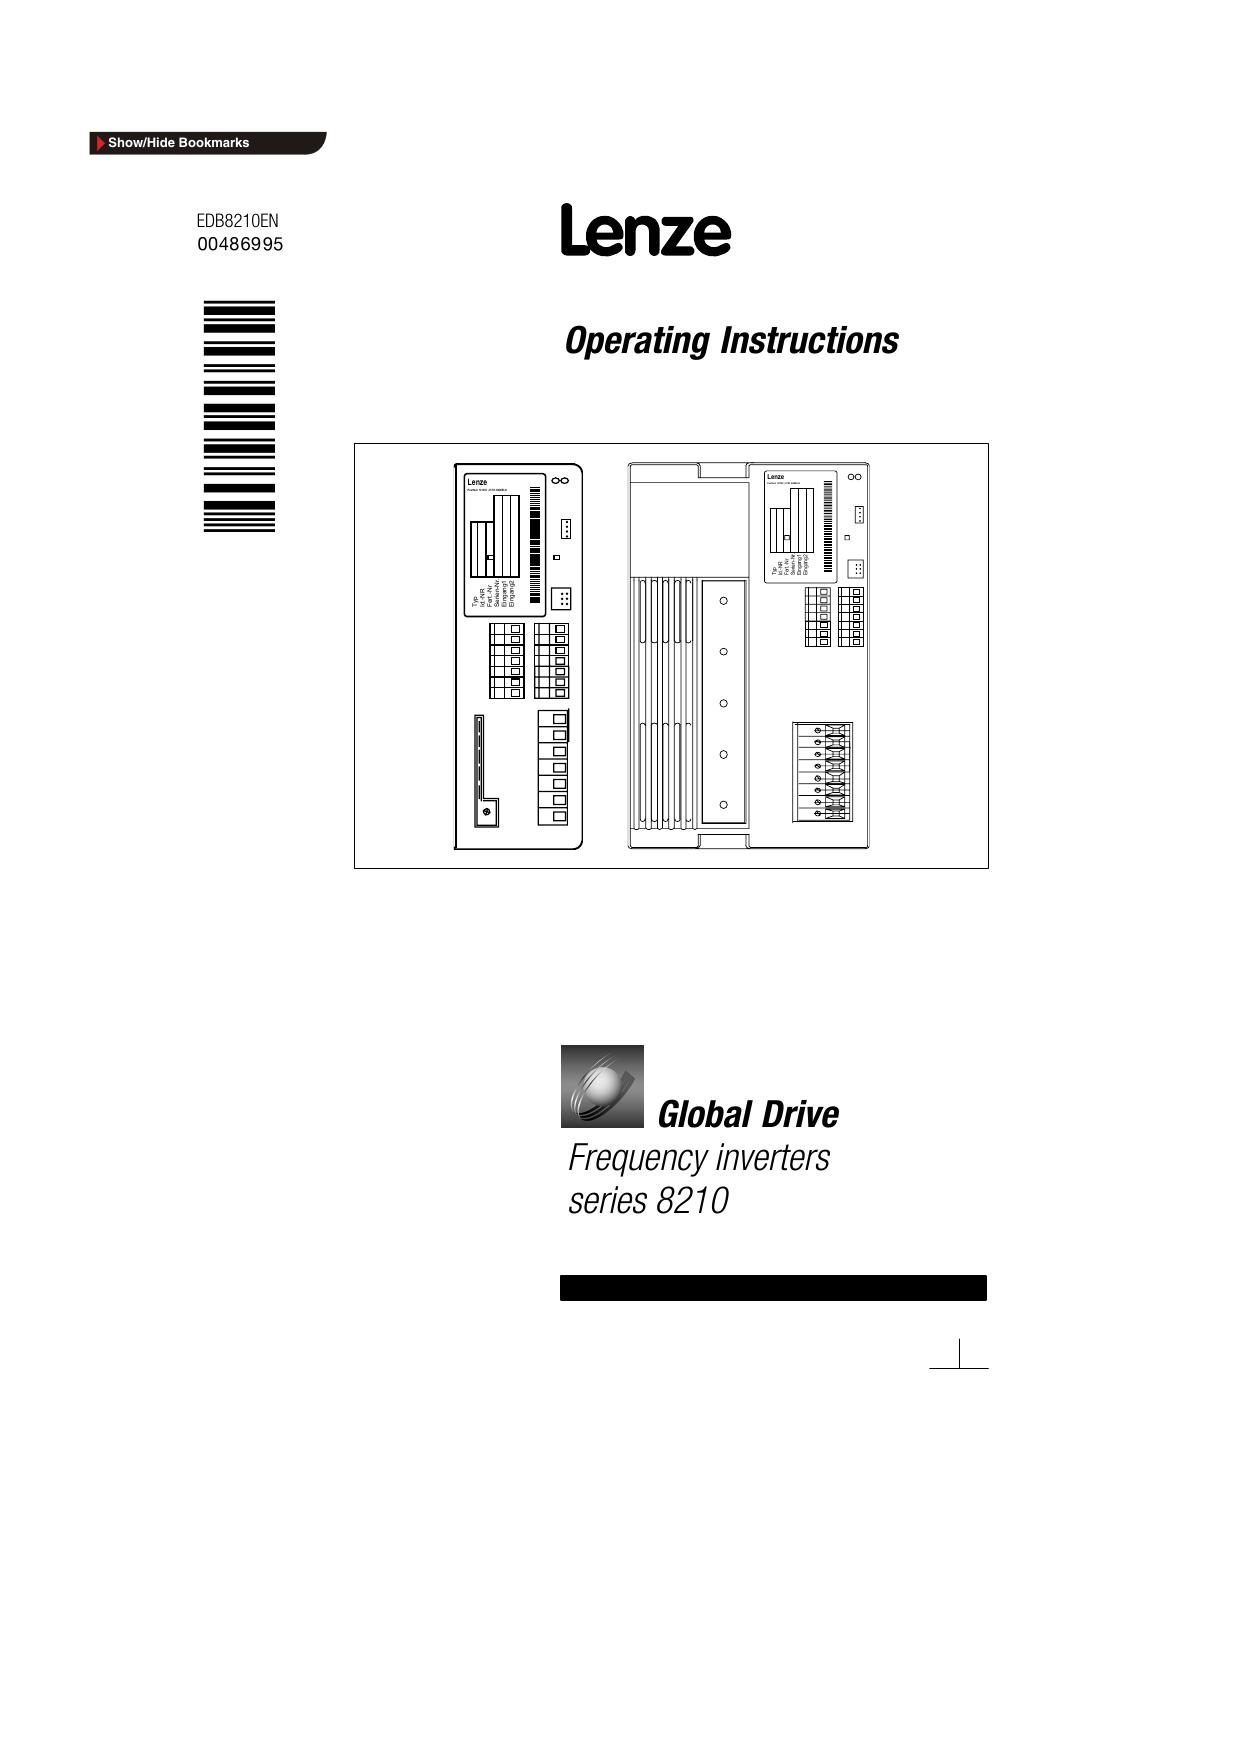 Lenze Wiring Diagram 2014 Ford Raptor Wiring Diagram Delco